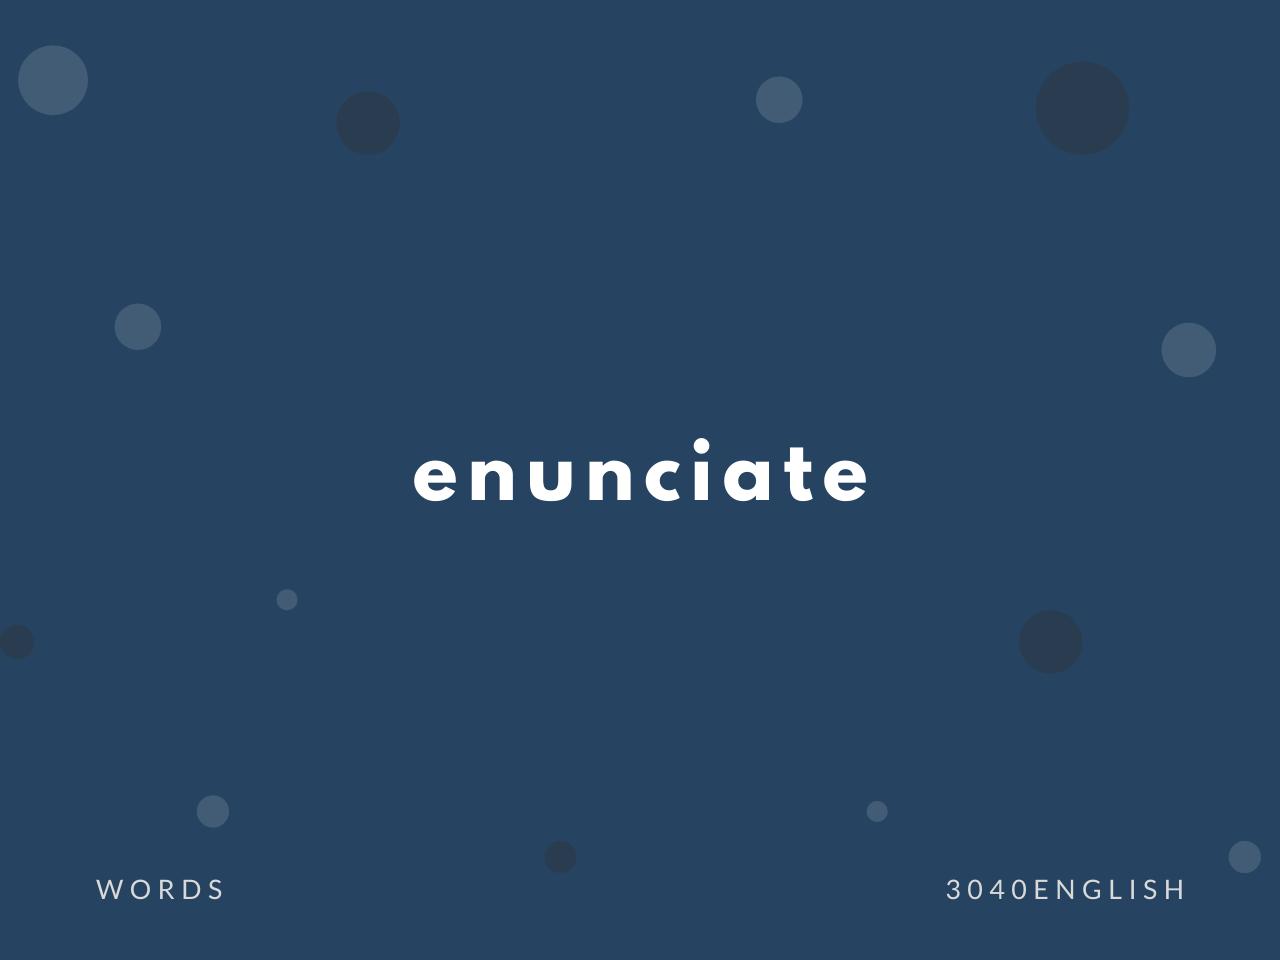 enunciate の意味と簡単な使い方【音読用例文あり】